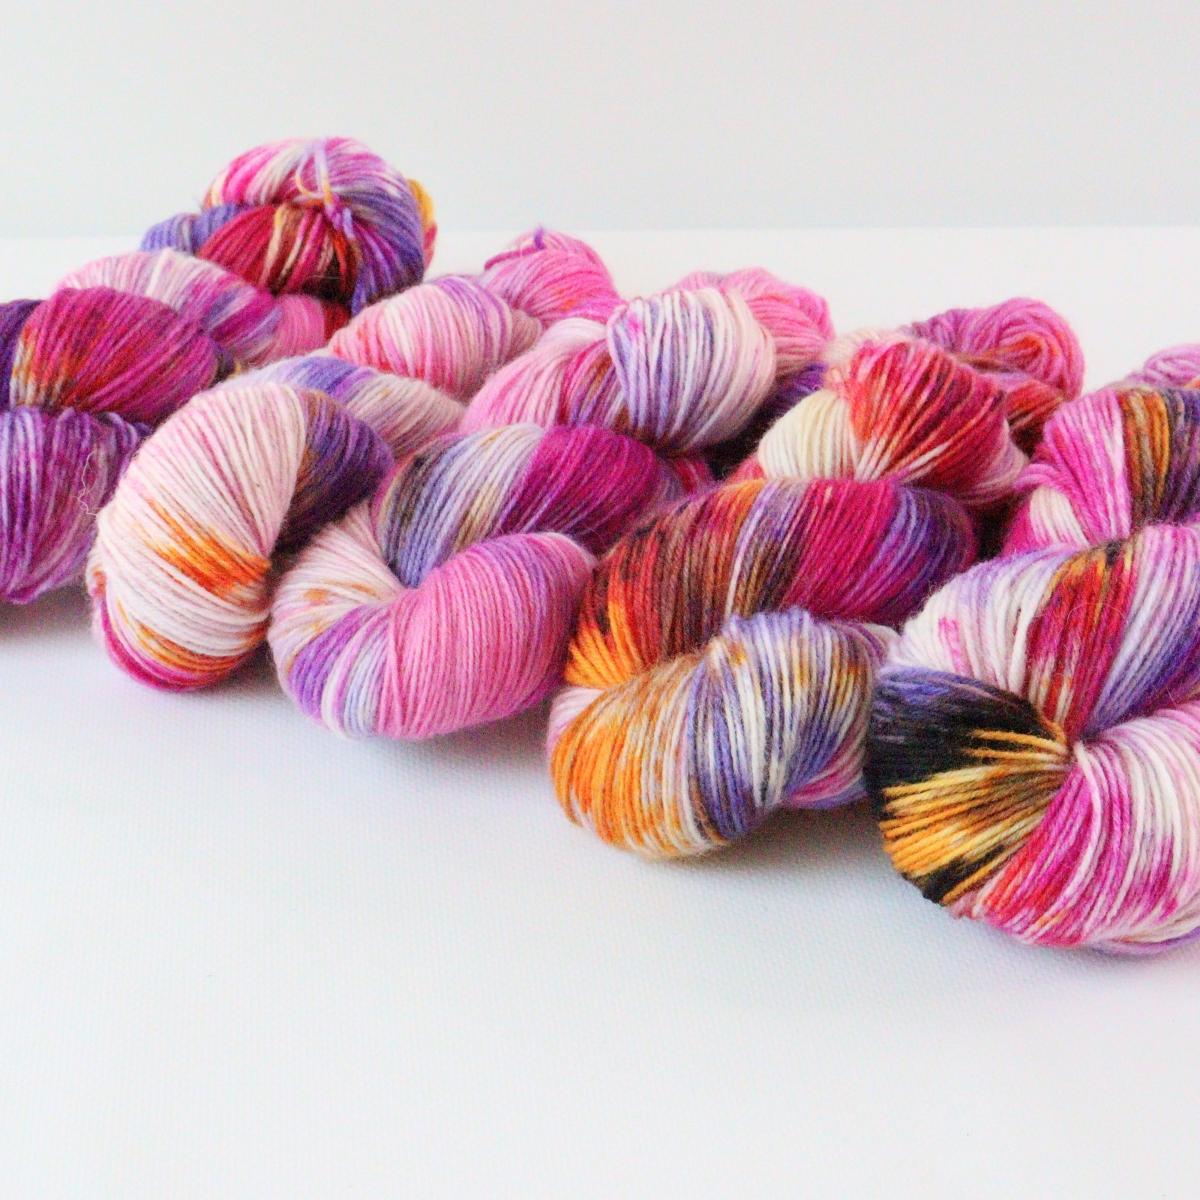 woodico.pro hand dyed yarn 084 4 1200x1200 - Hand dyed yarn / 084